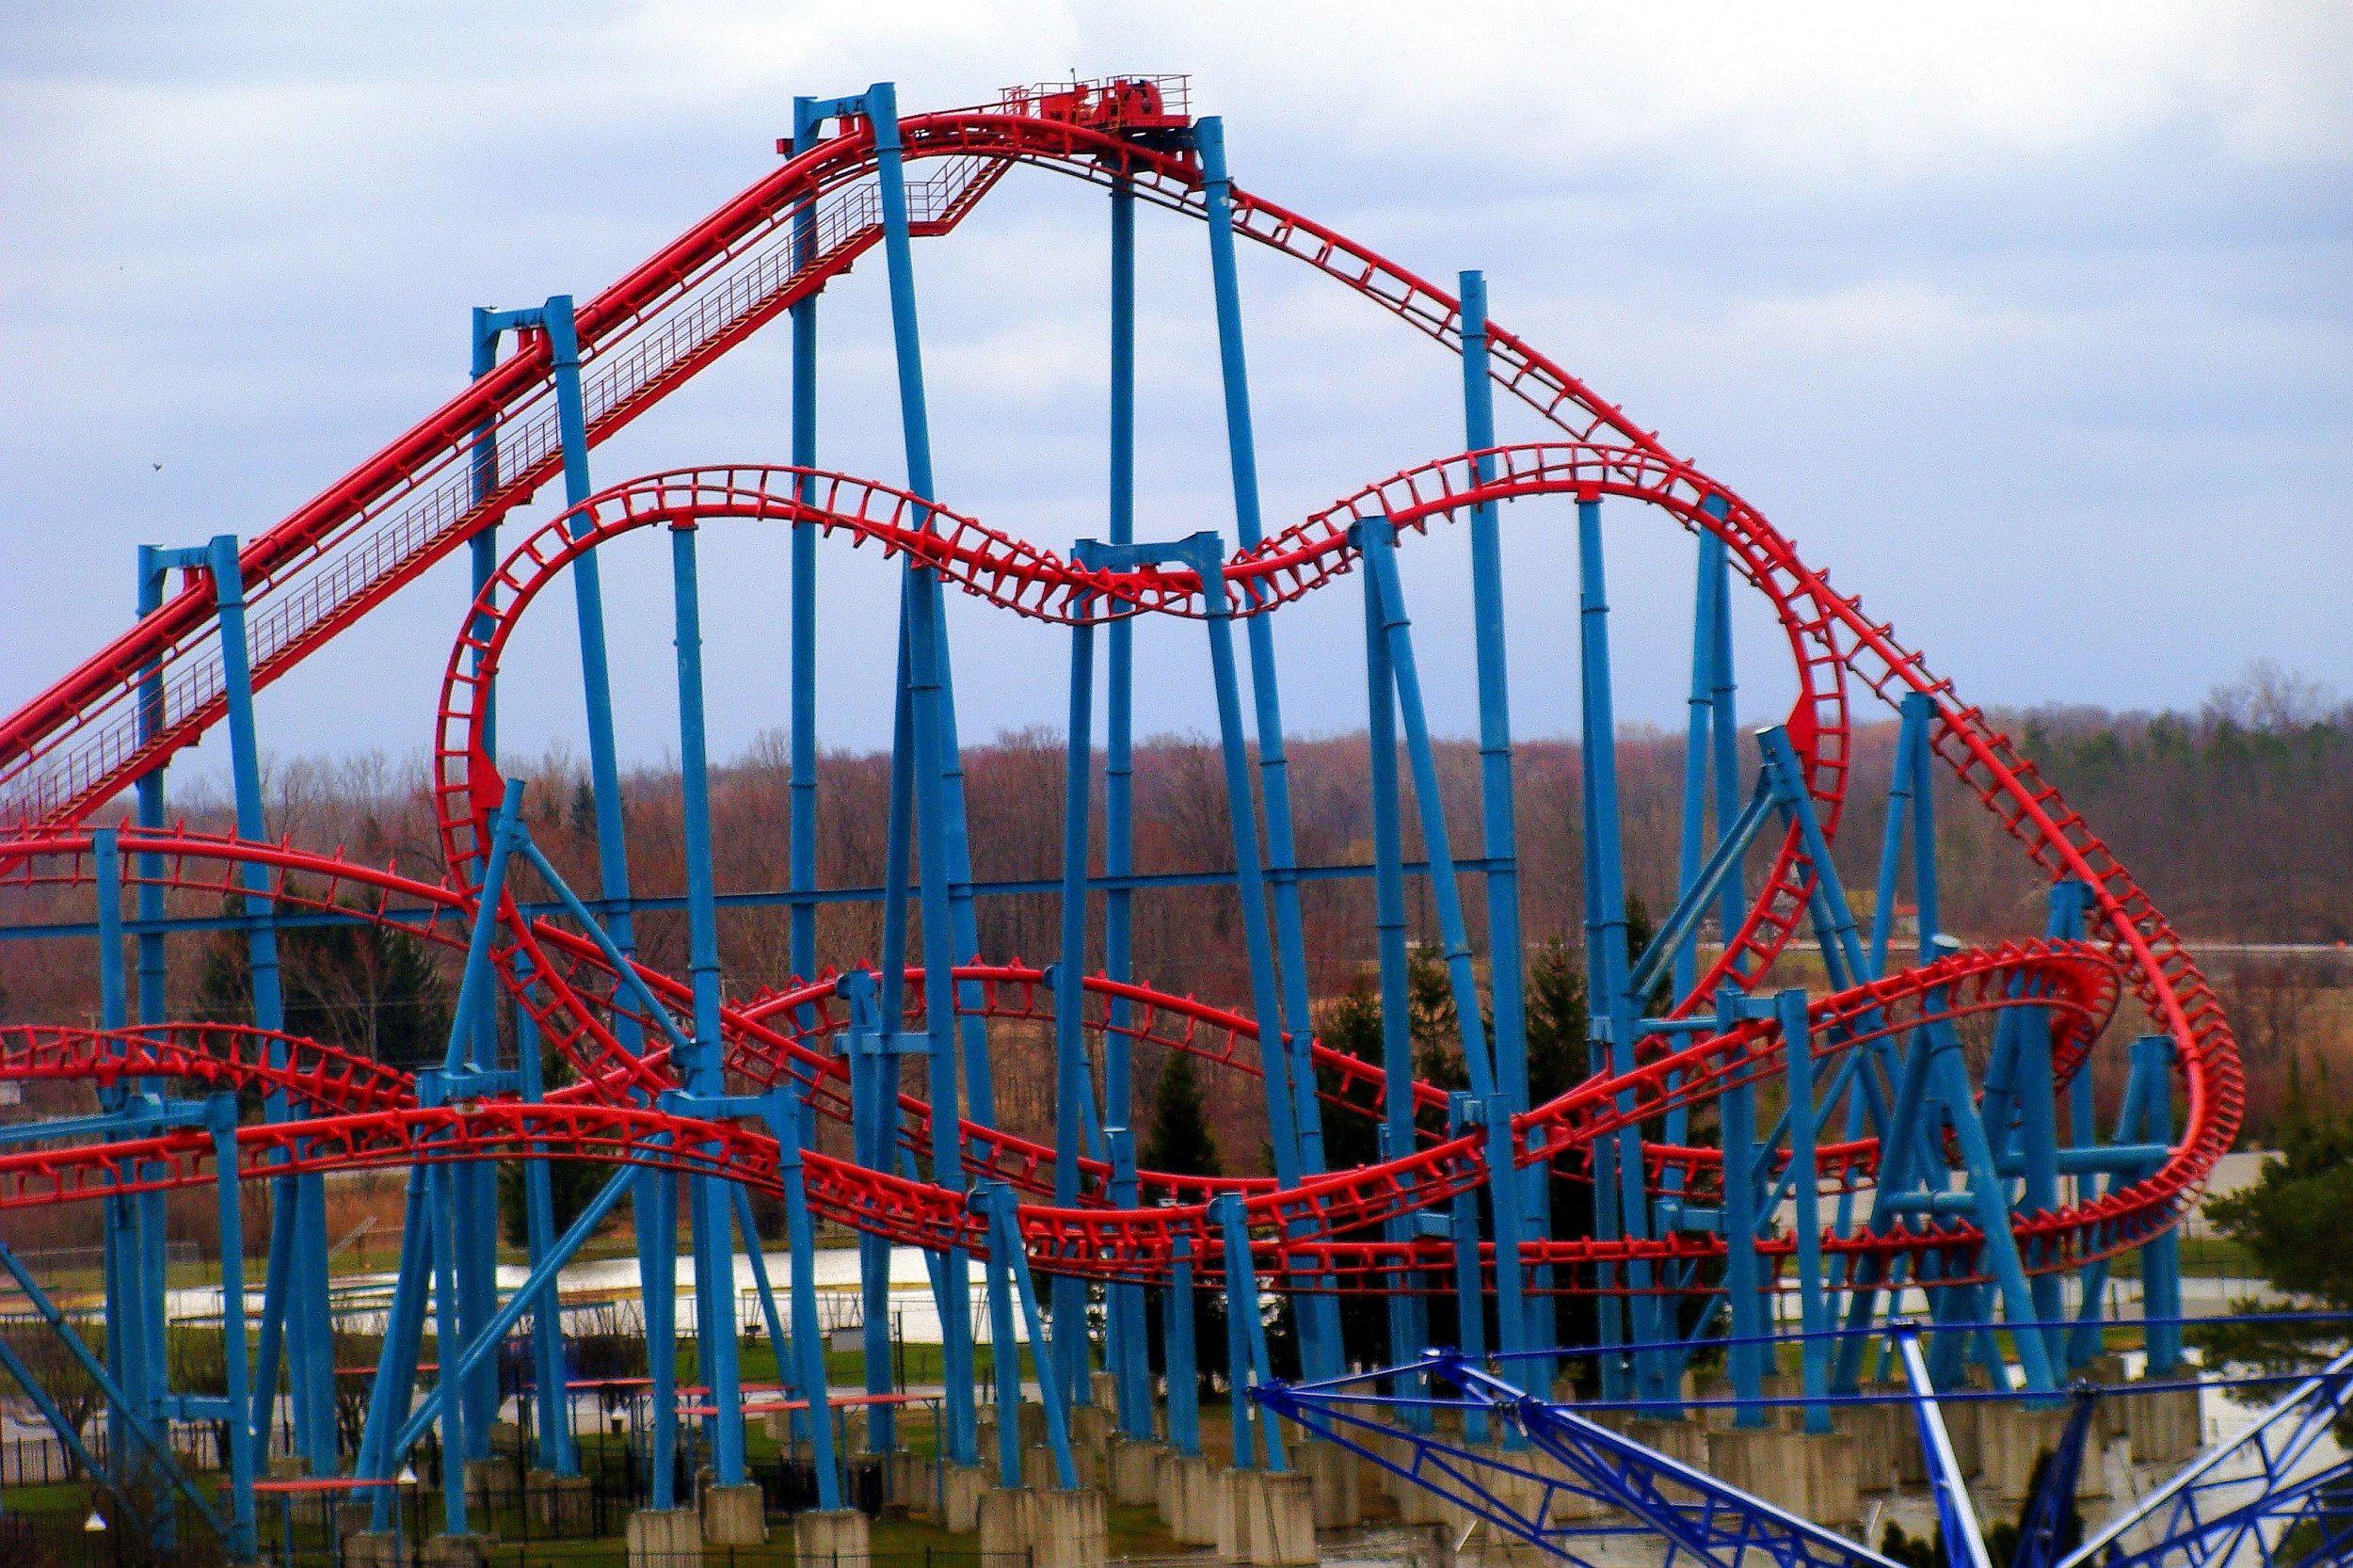 Darien Lake Theme Park Superman Or Ride Of Steel Roller Coaster Darien Lake Lake Photos Roller Coaster